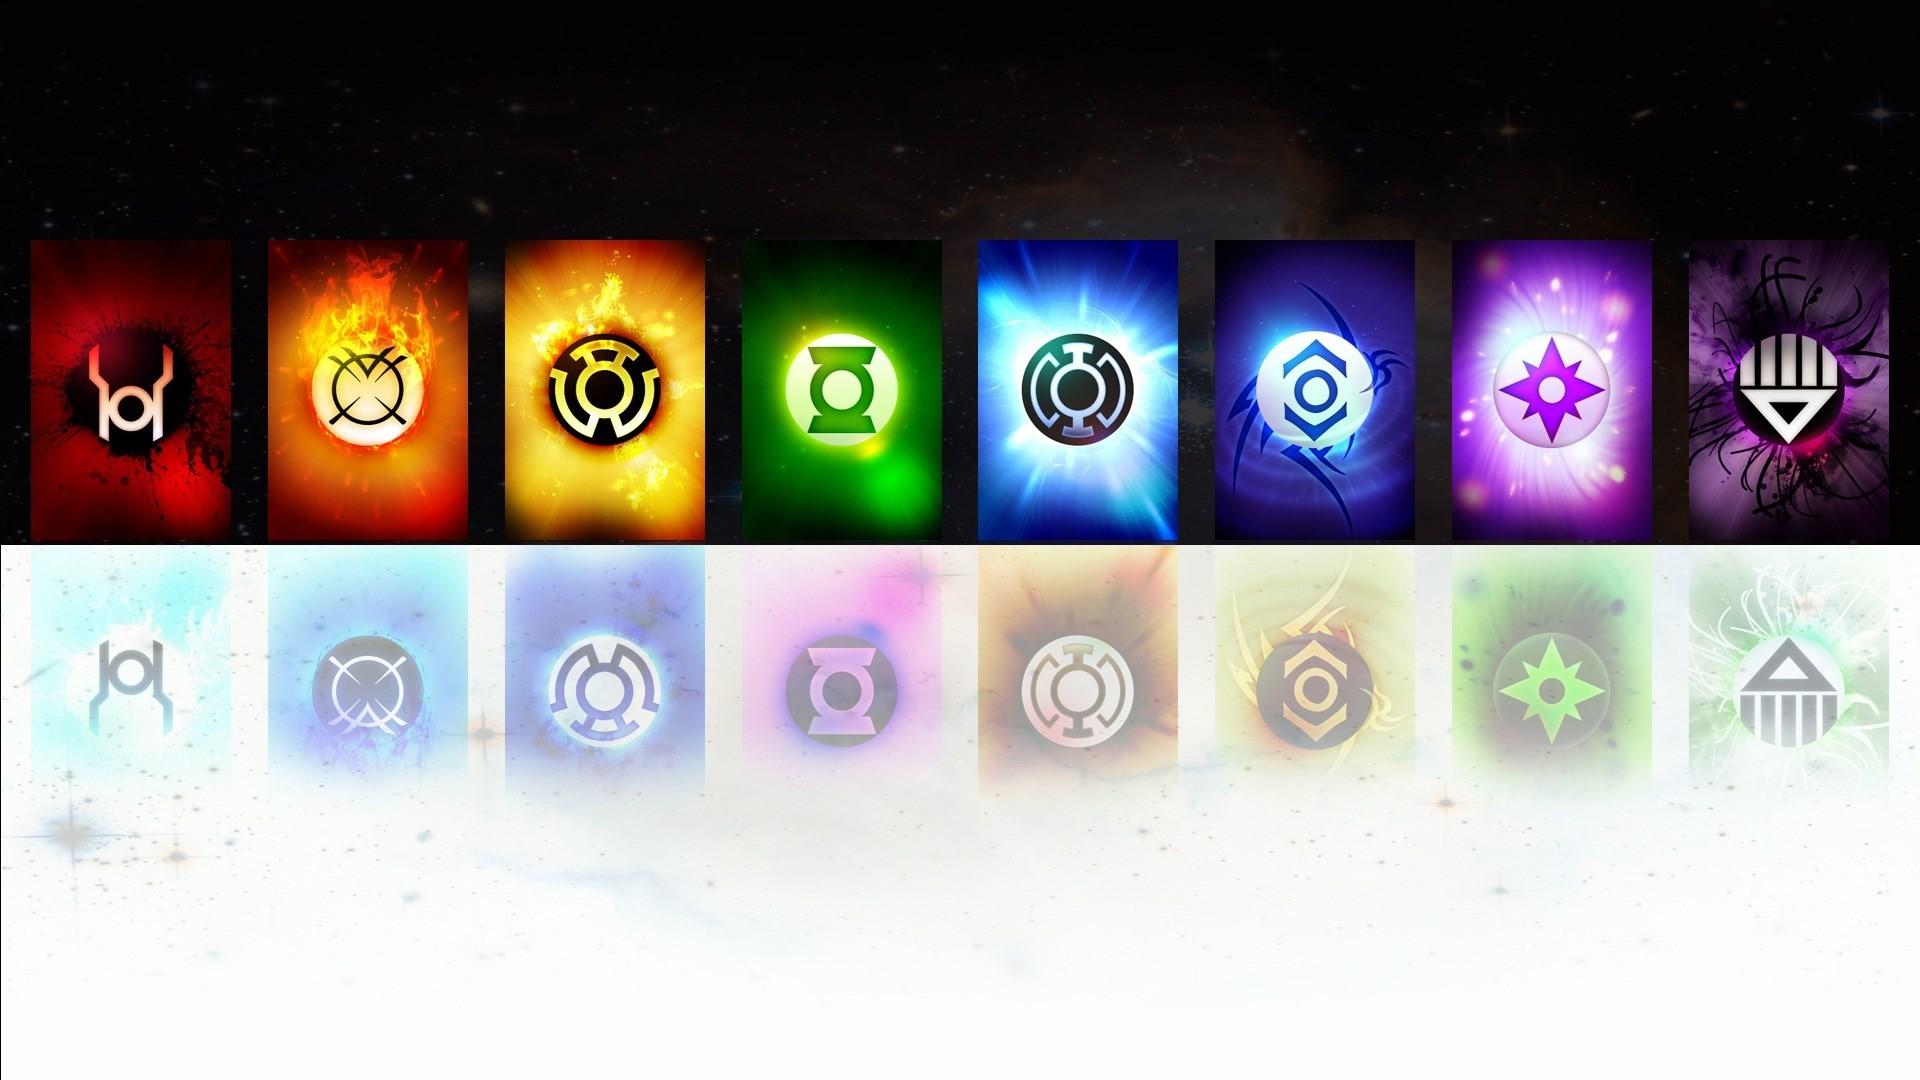 All lantern corps